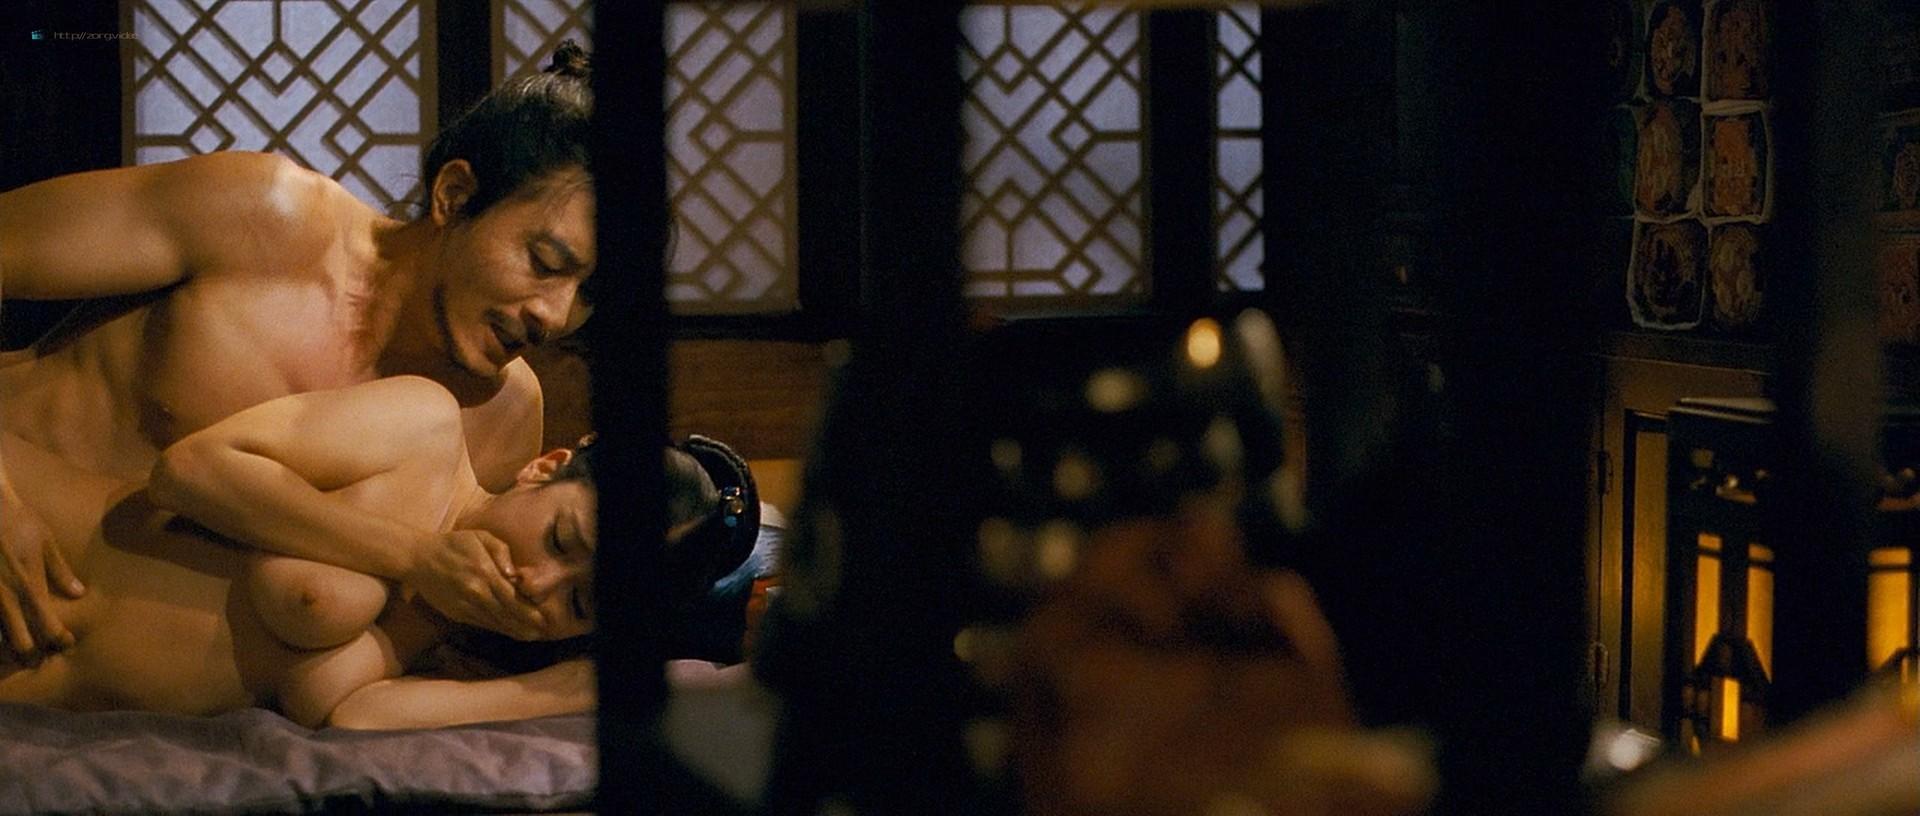 Cho Yeo-jeong nude sex Ryu Hyun-kyung nude too- The Servant (KR-2010) HD 1080p BluRay (8)